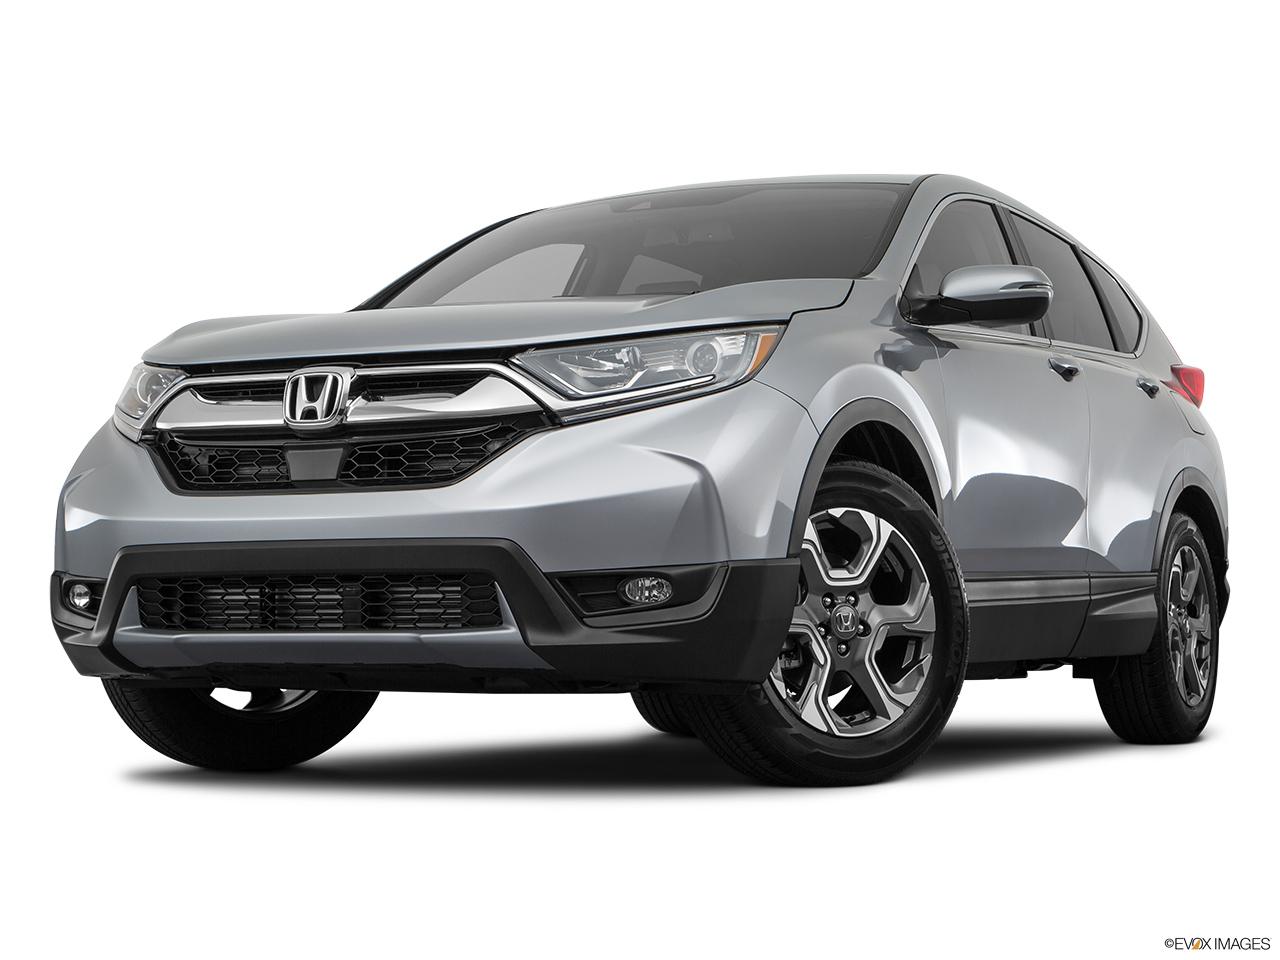 Awd Cars List: Car Pictures List For Honda CR-V 2018 Touring AWD (Qatar